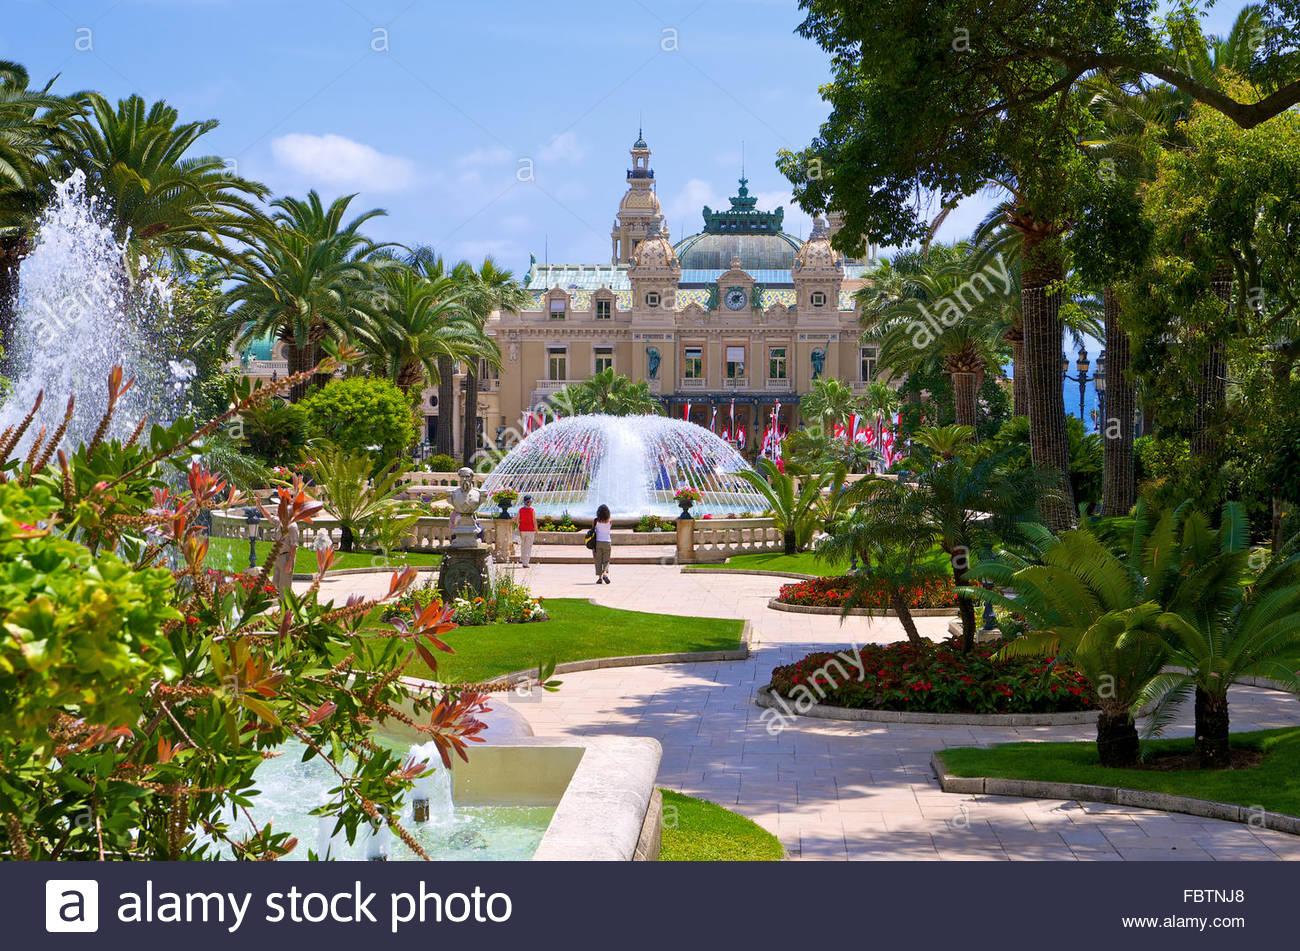 Impeccable garden in Monaco - Stock Image